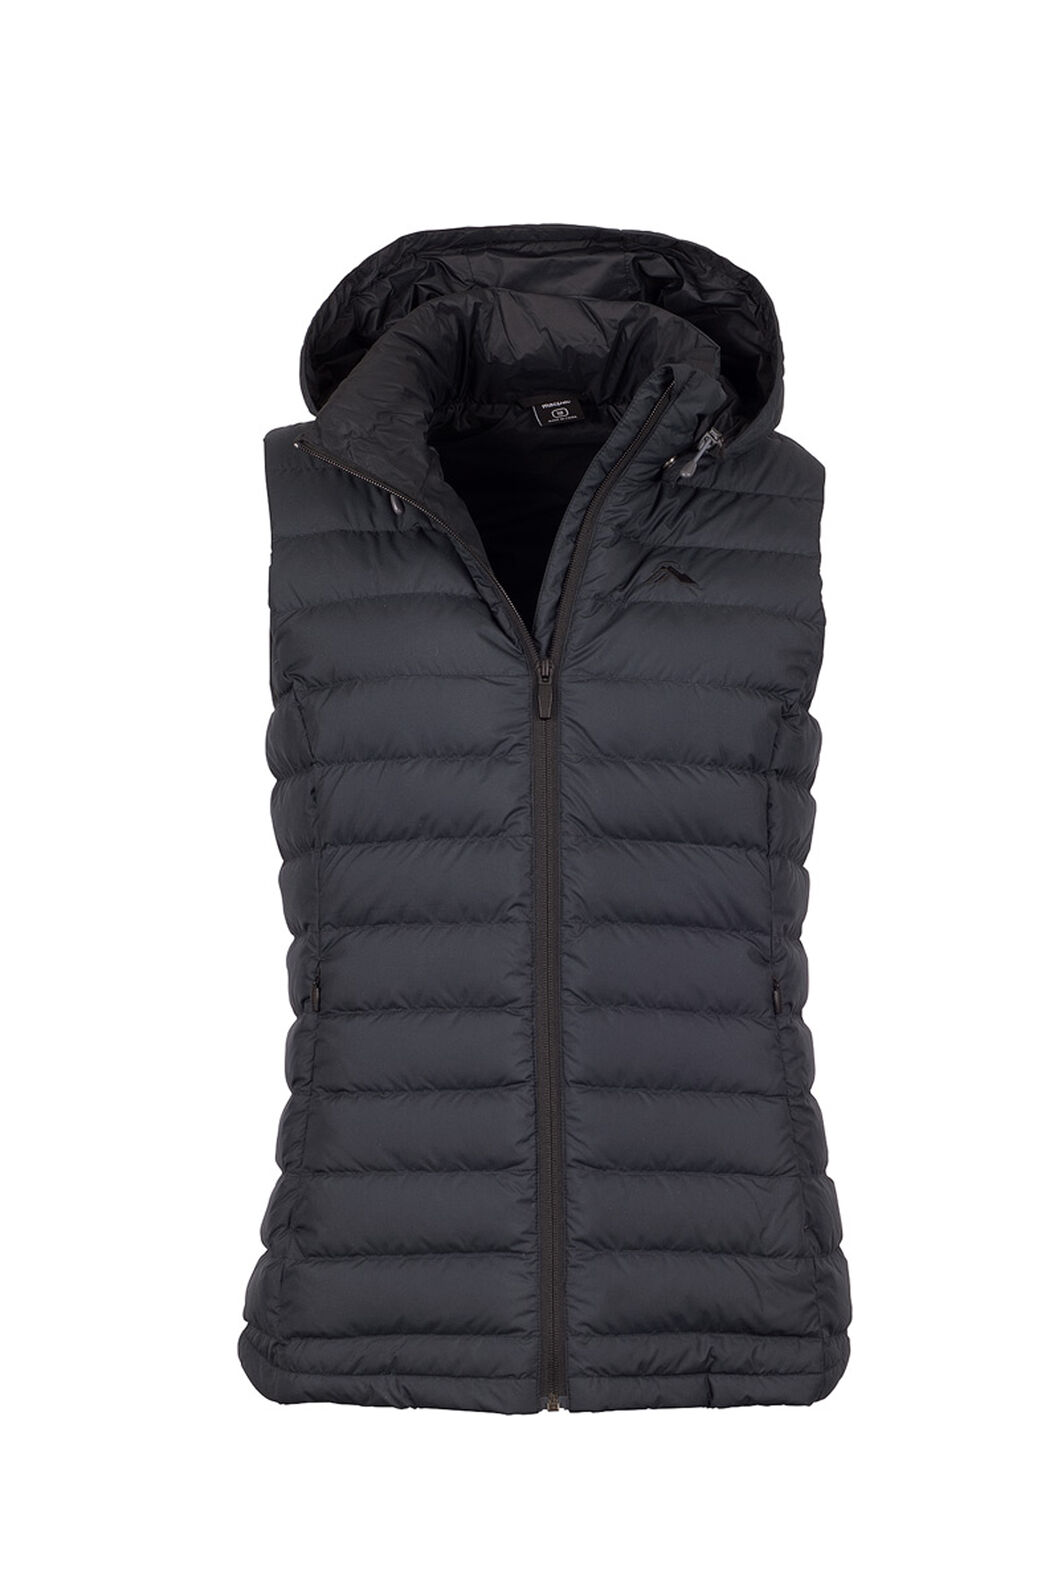 Macpac Zodiac Hooded Down Vest — Women's, Black, hi-res